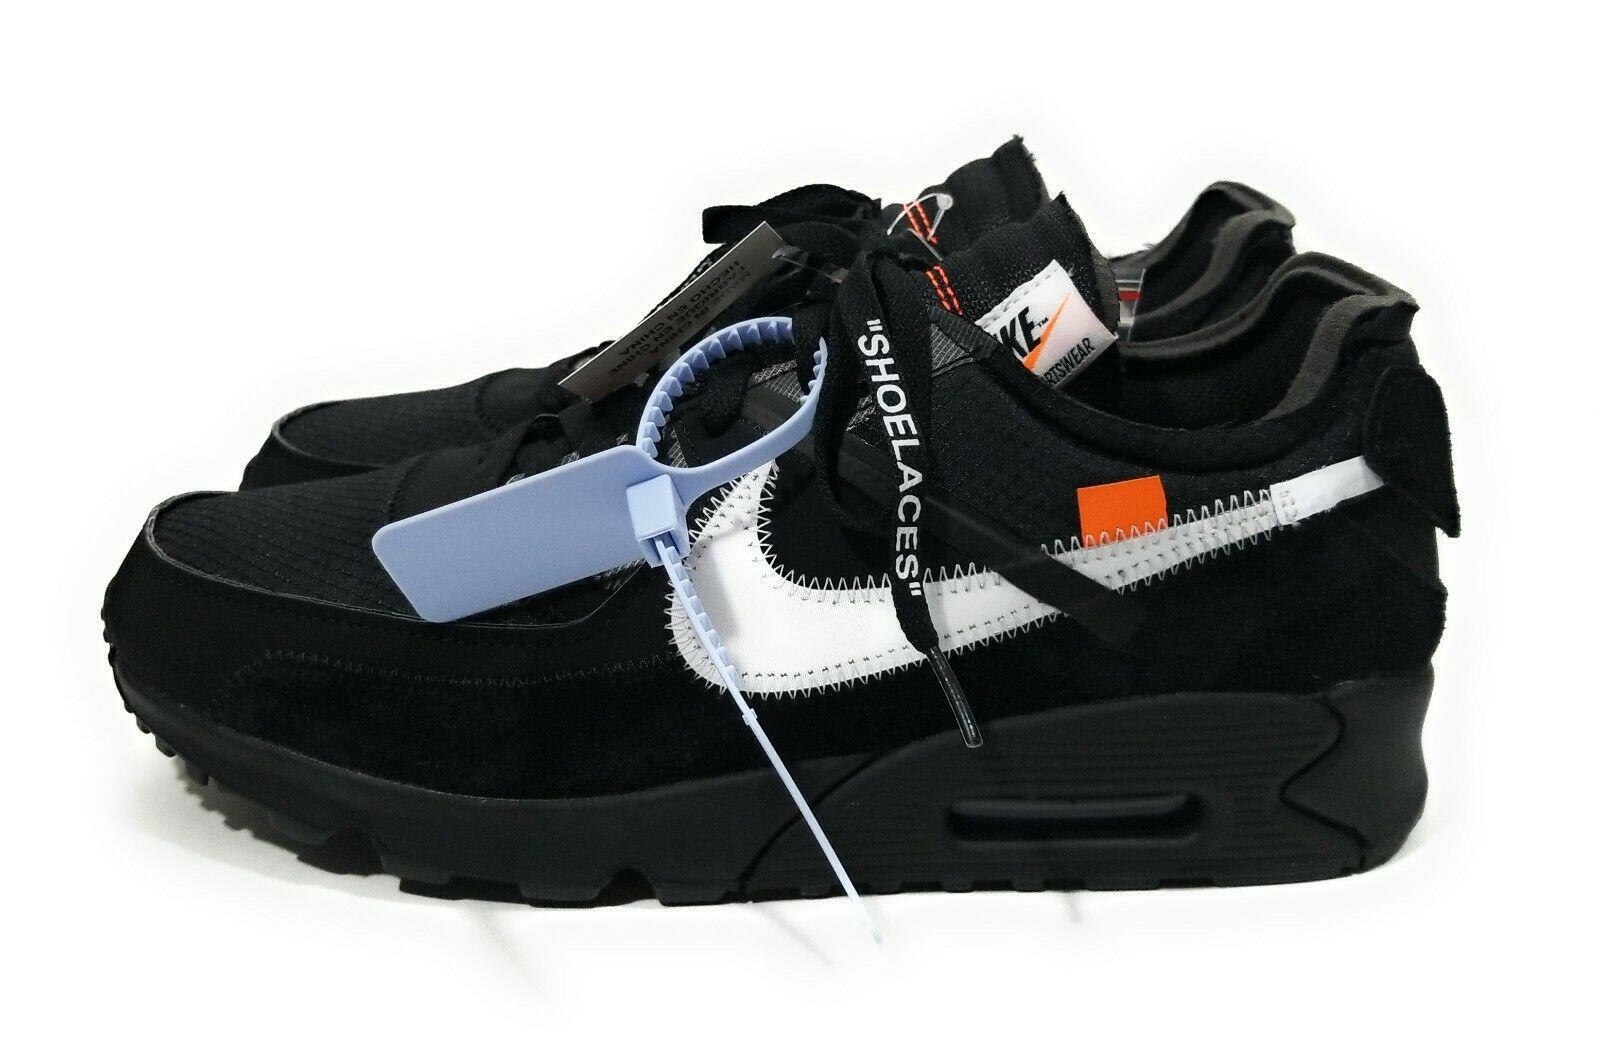 Nike Air Max 90 OFF WHITE Black